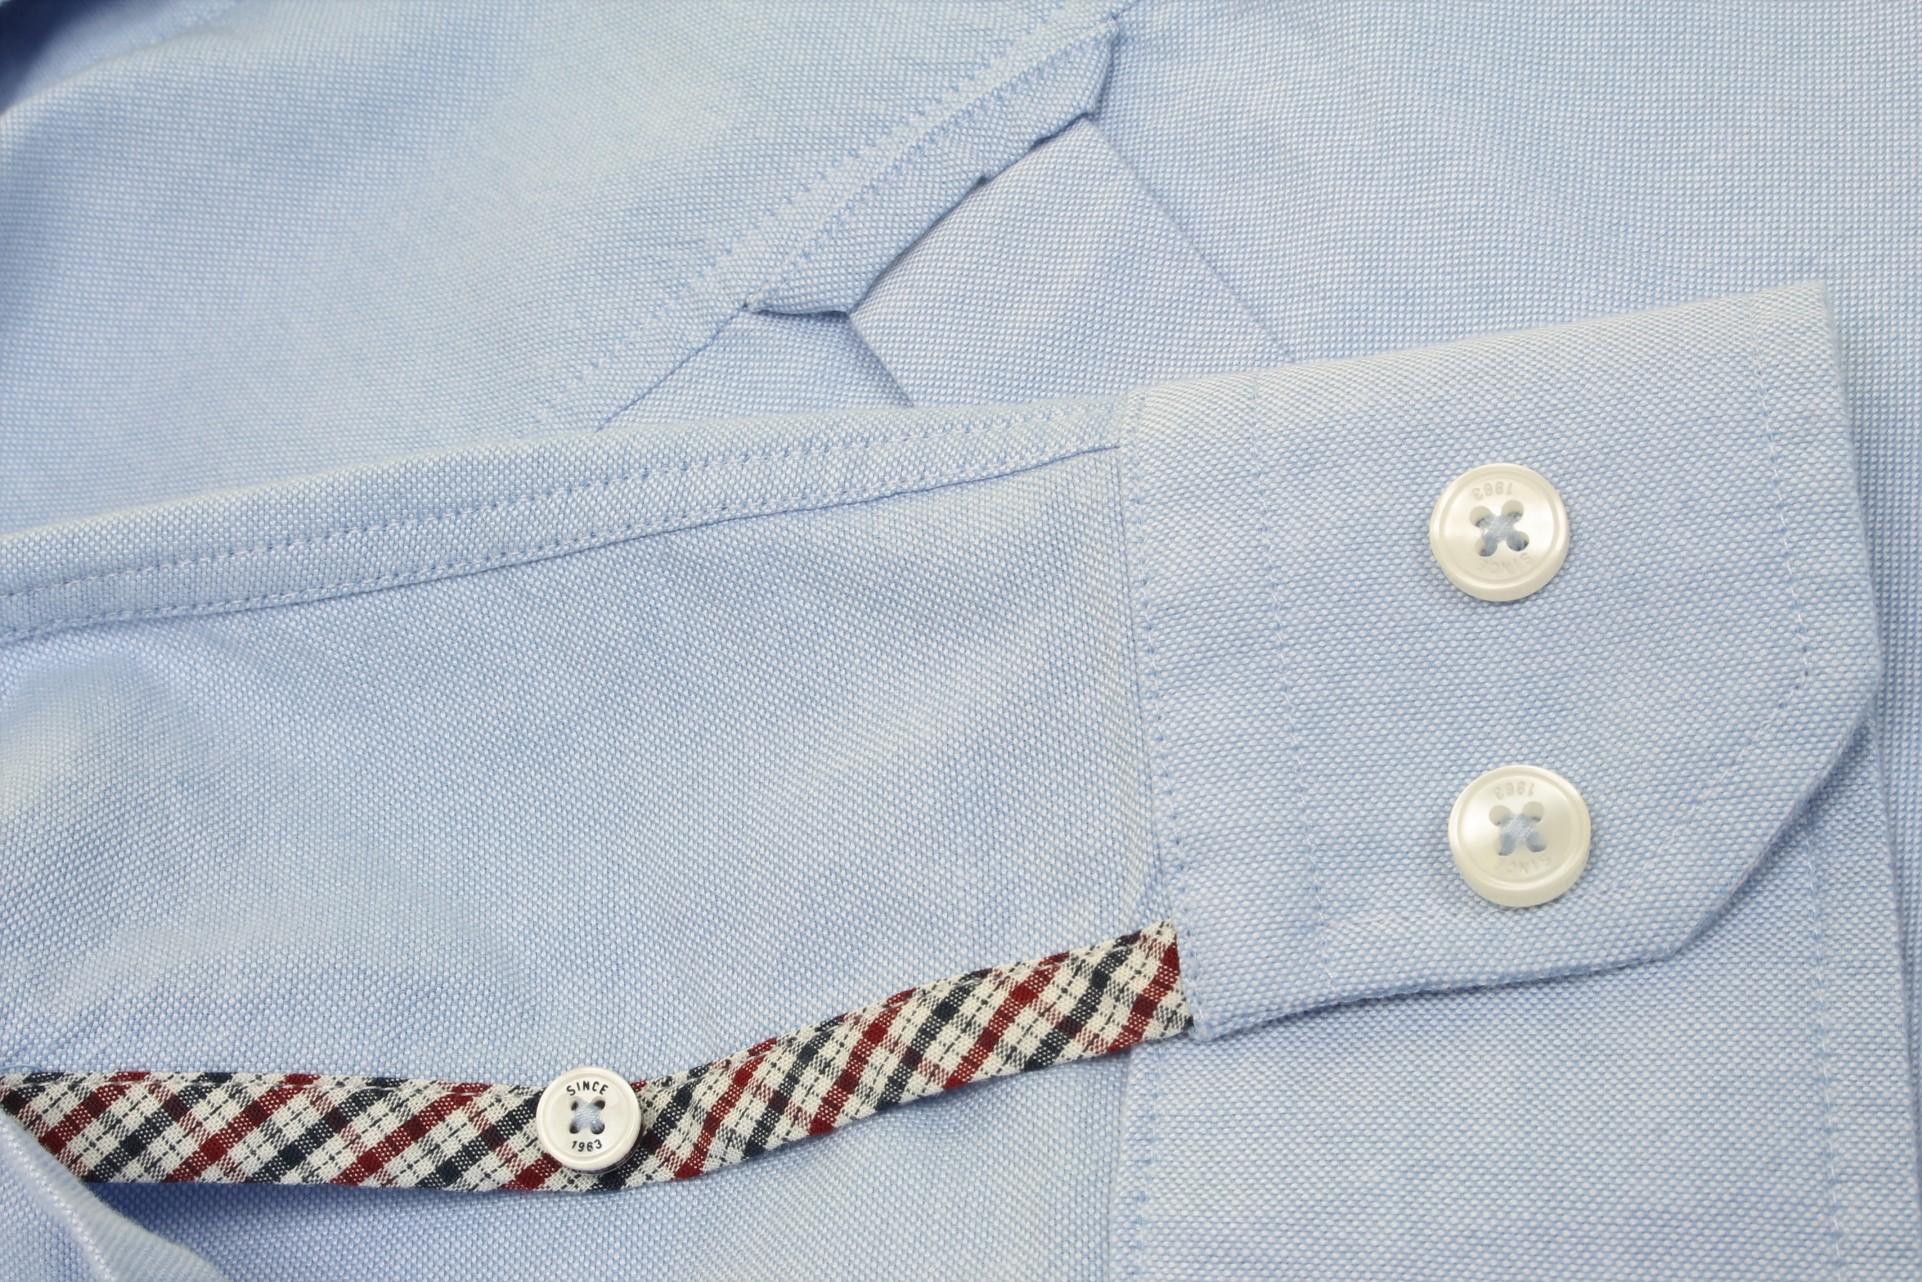 Mens-Oxford-Shirt-by-Ben-Sherman-Long-Sleeved thumbnail 36